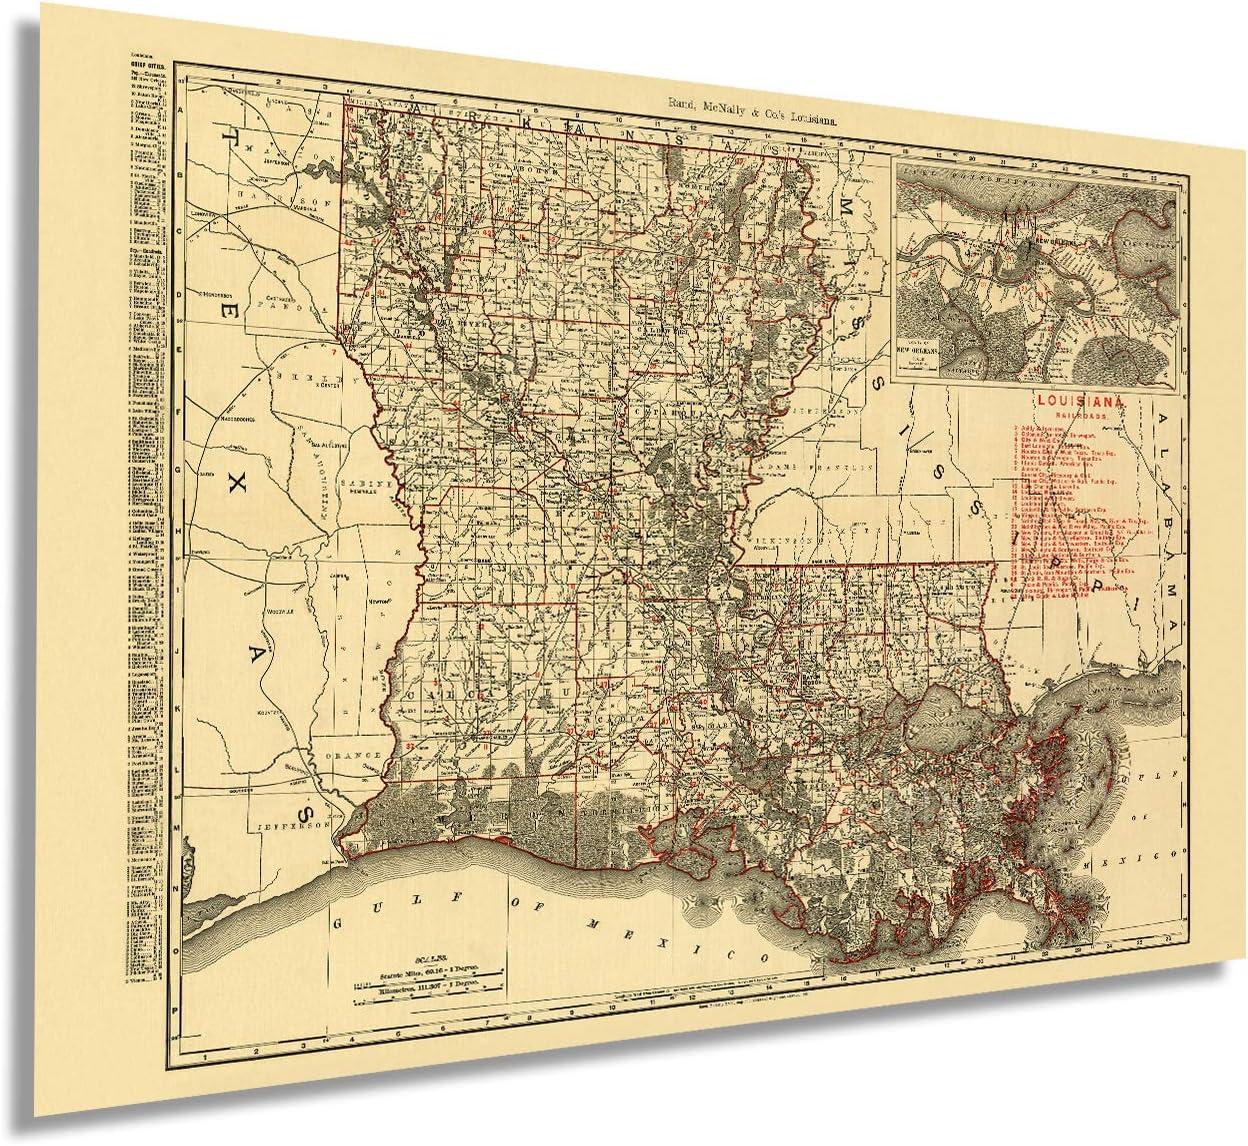 Buy Historix Vintage 20 Map of Louisiana   20x20 Inch Vintage ...